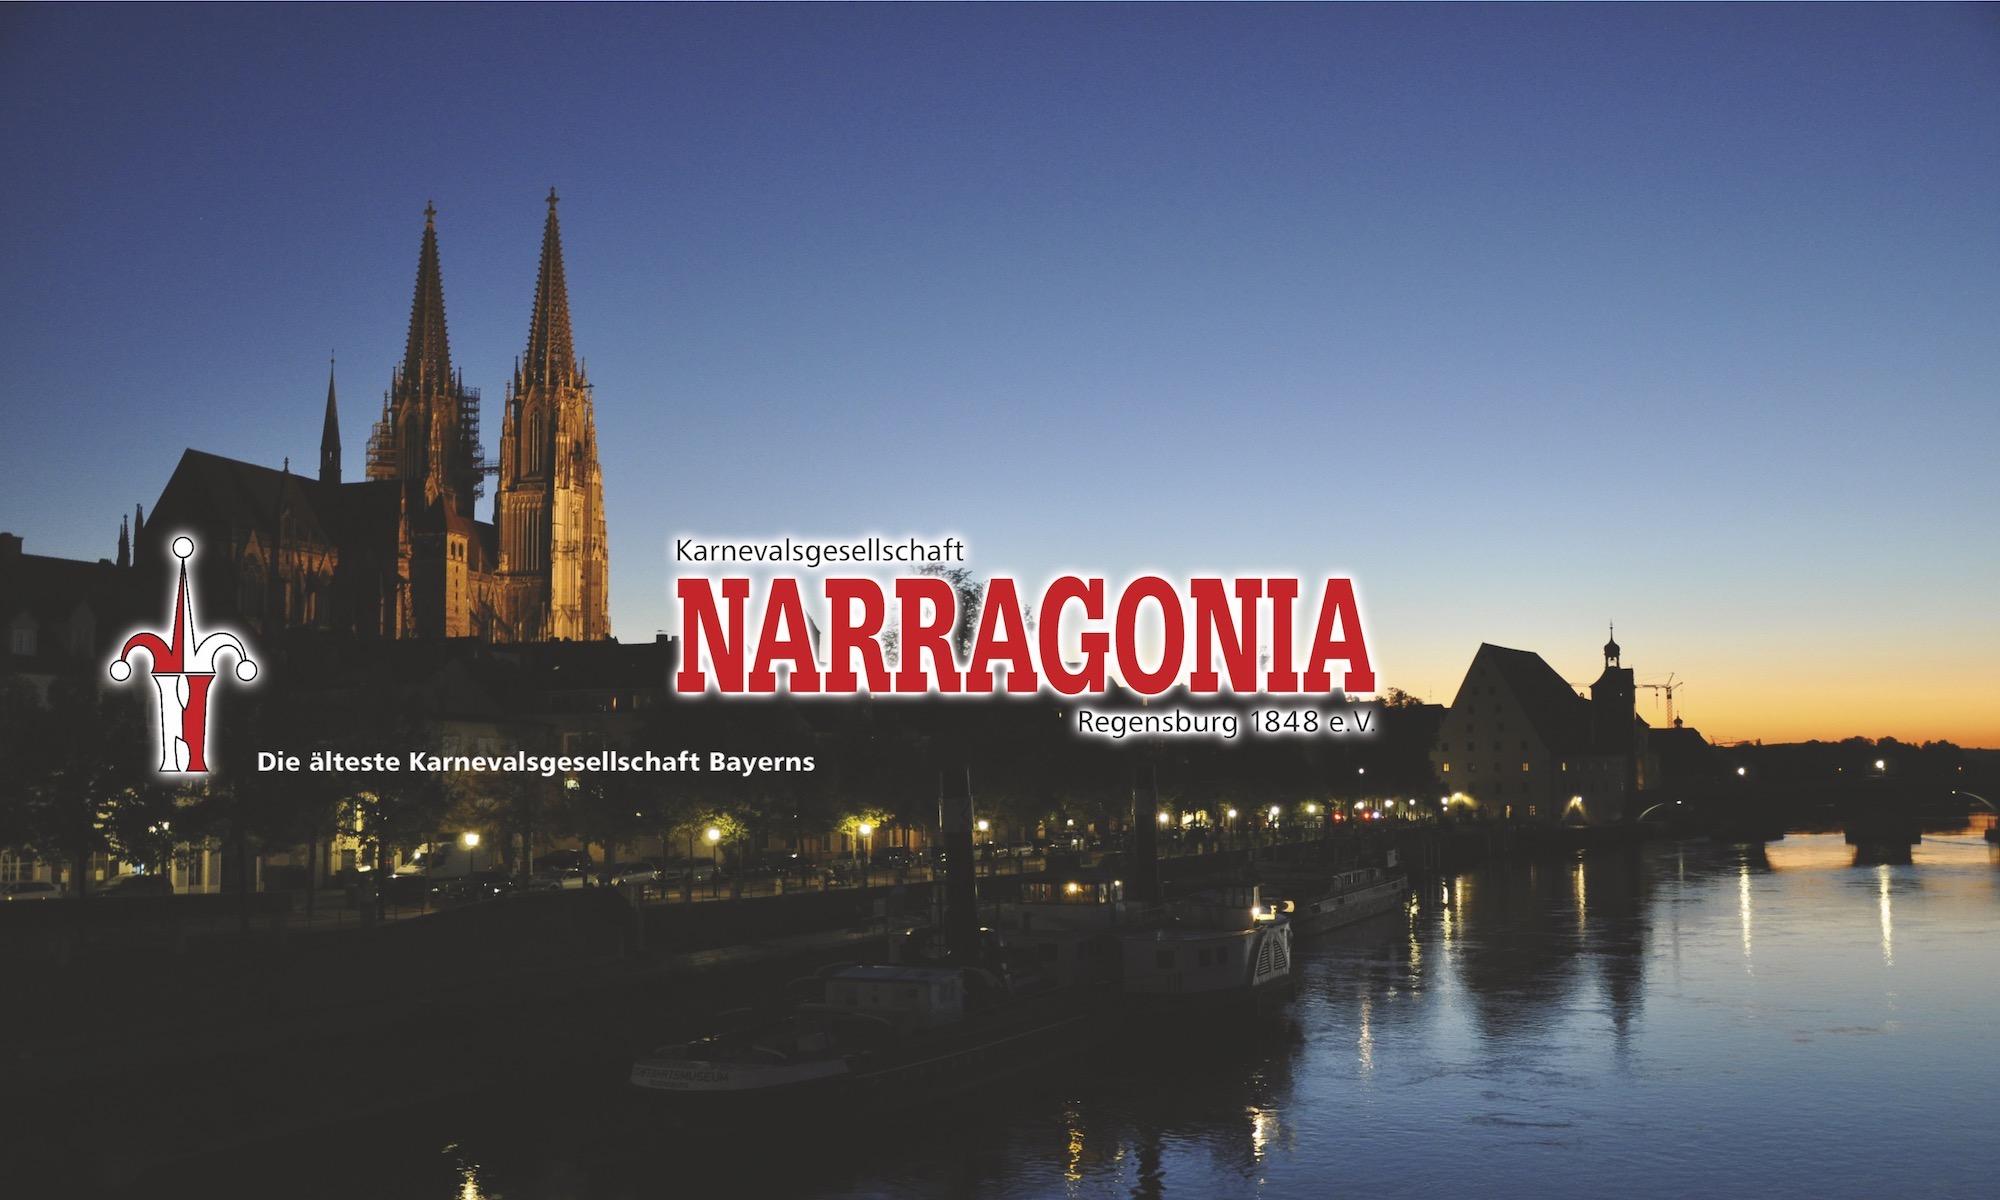 Narragonia Regensburg